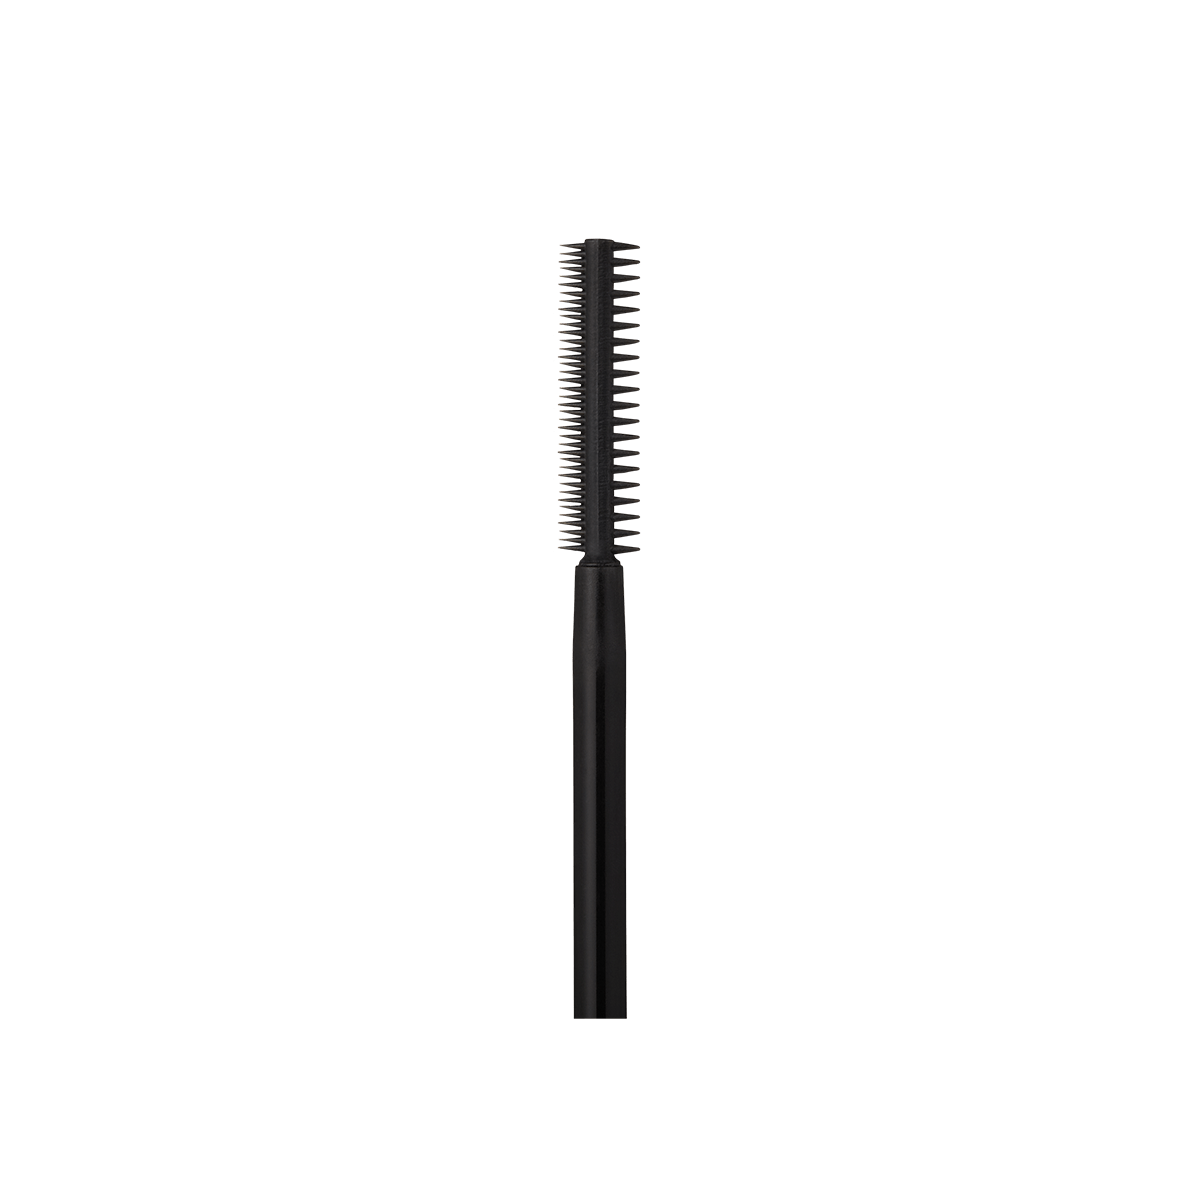 collab-the-fundamental-lash-primer-brush.png